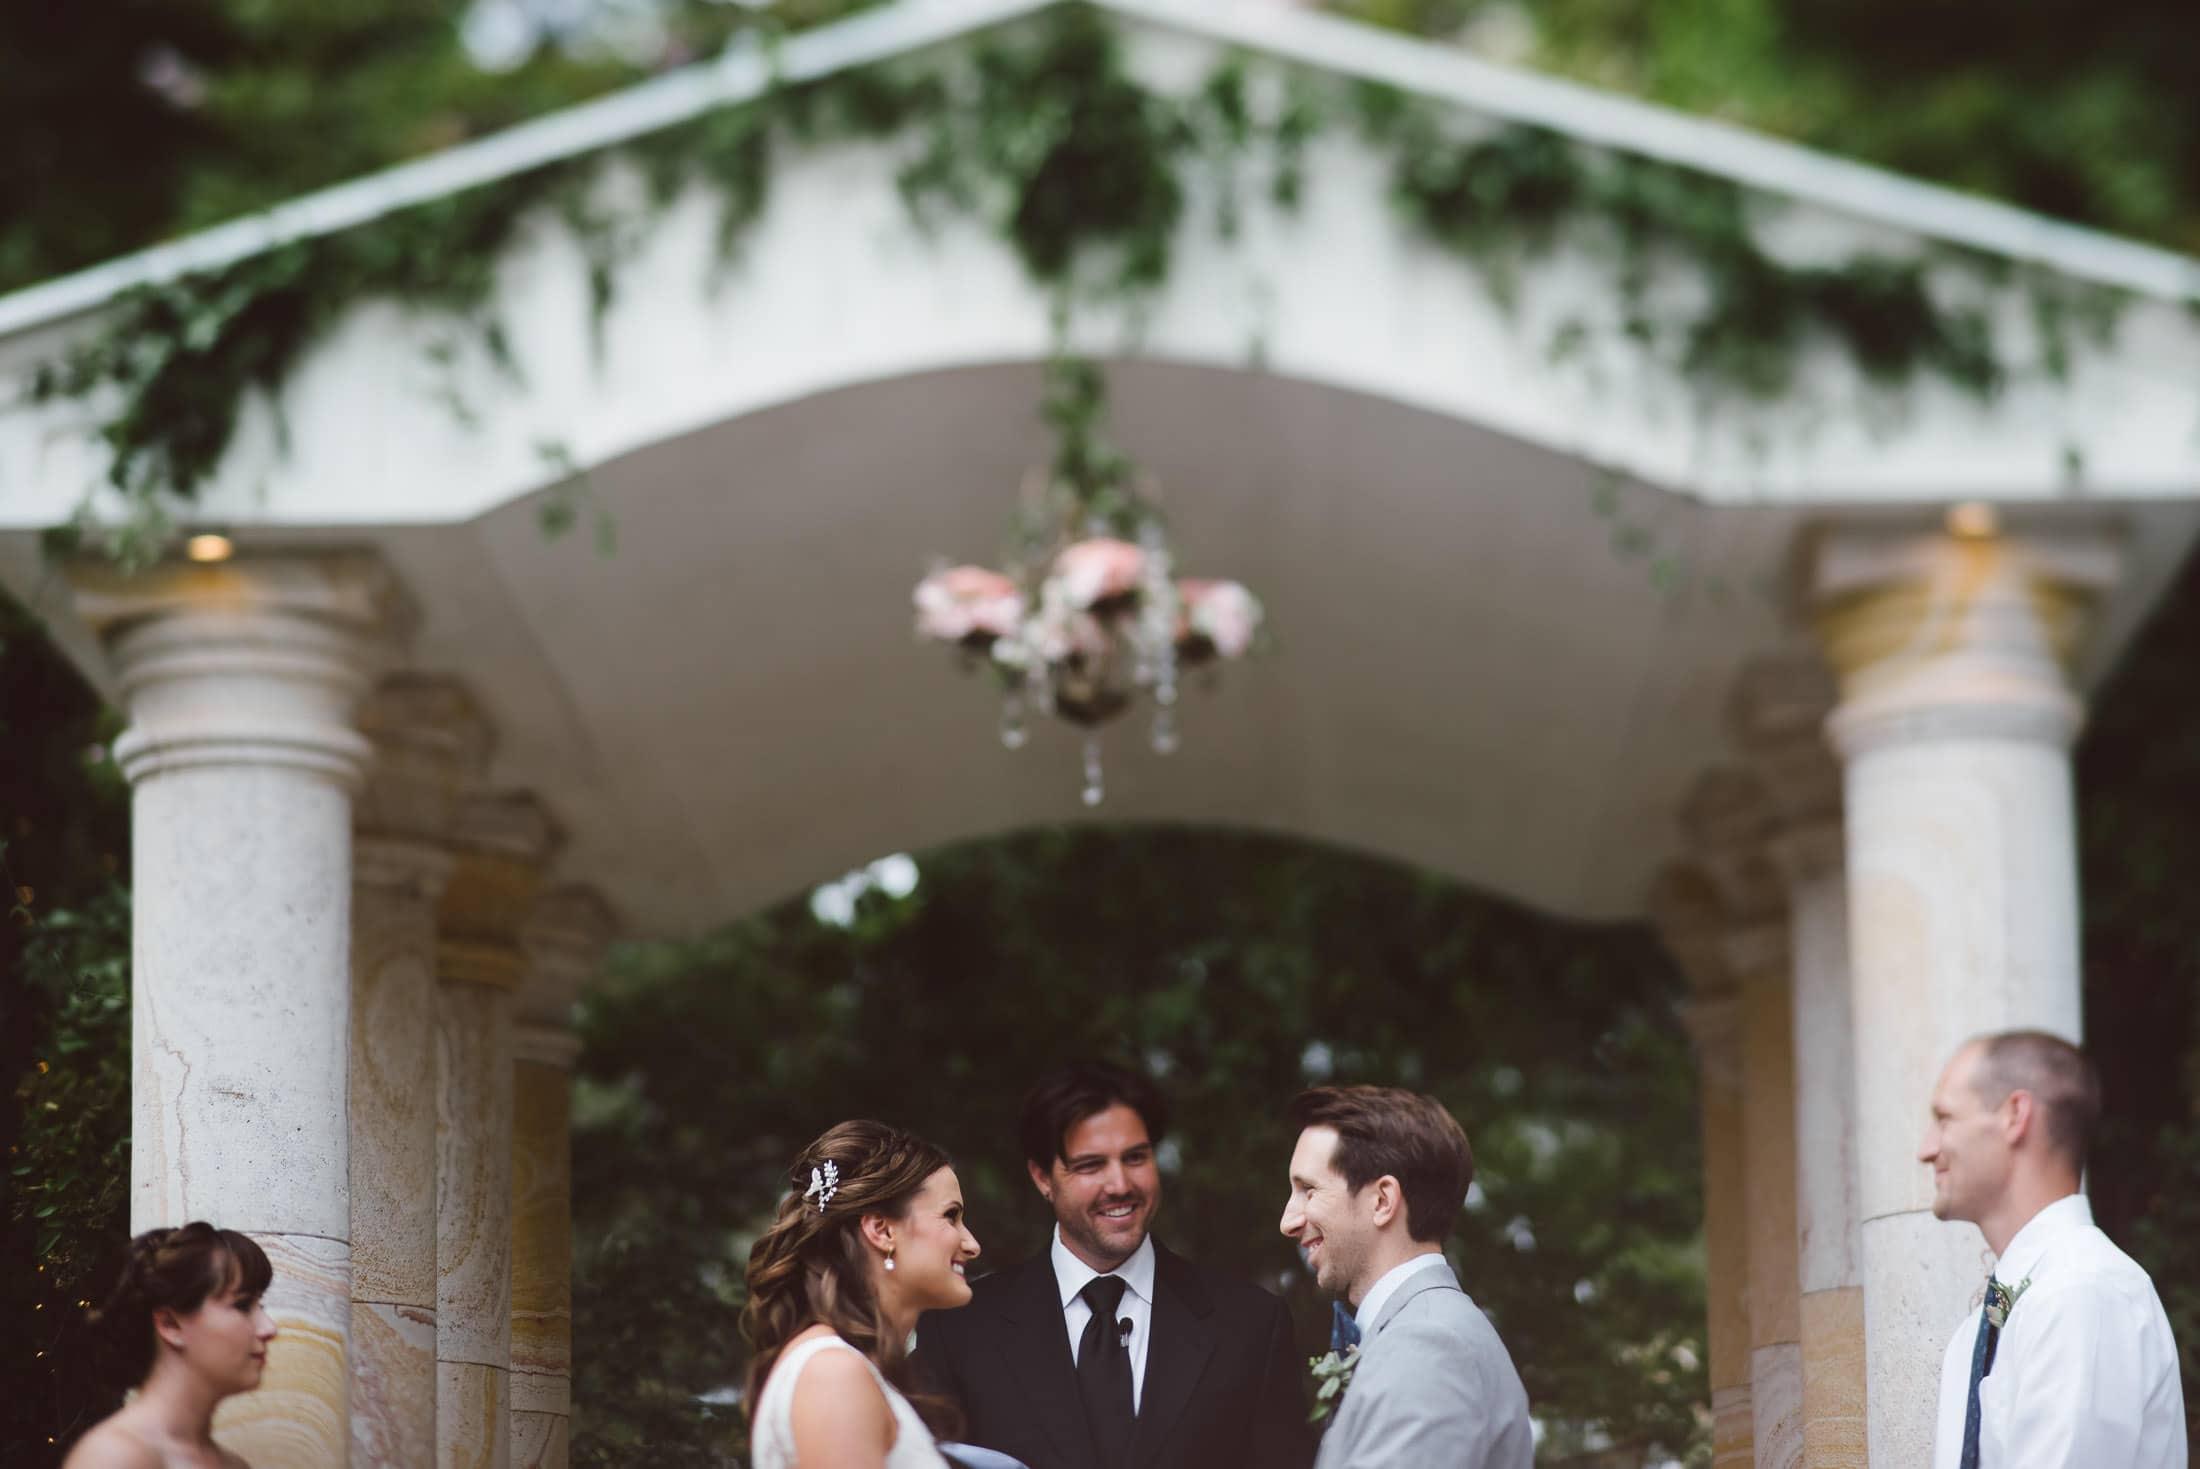 brownstone gardens wedding ceremony